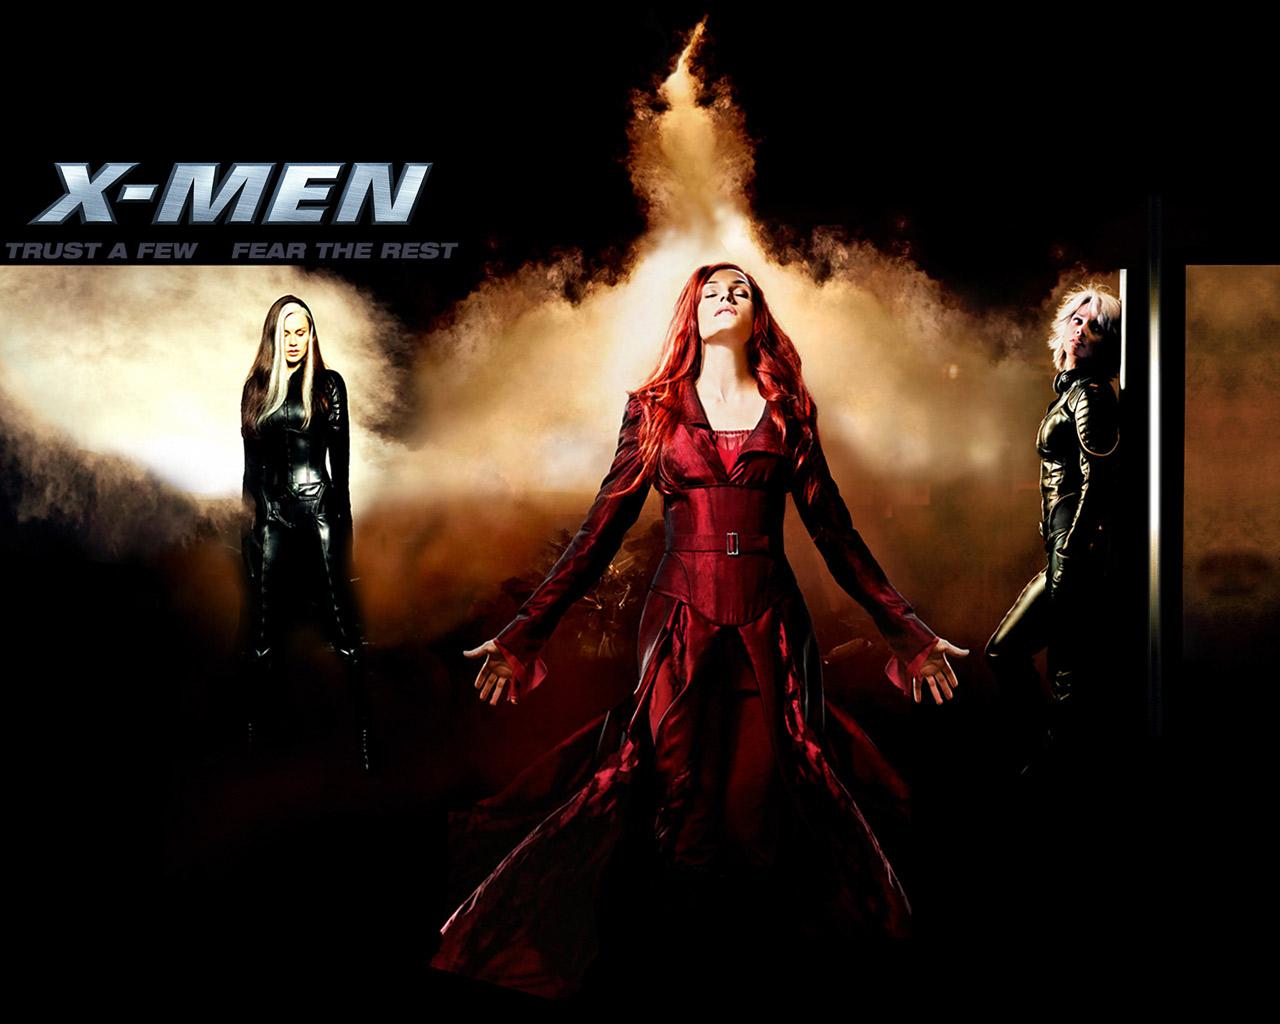 https://2.bp.blogspot.com/-miJMUpqDe60/TaWpMffjT9I/AAAAAAAAAOY/3dCdP0Jo5w4/s1600/X-Men_-_The_Movie%252C_2000%252C_Famke_Janssen.jpg